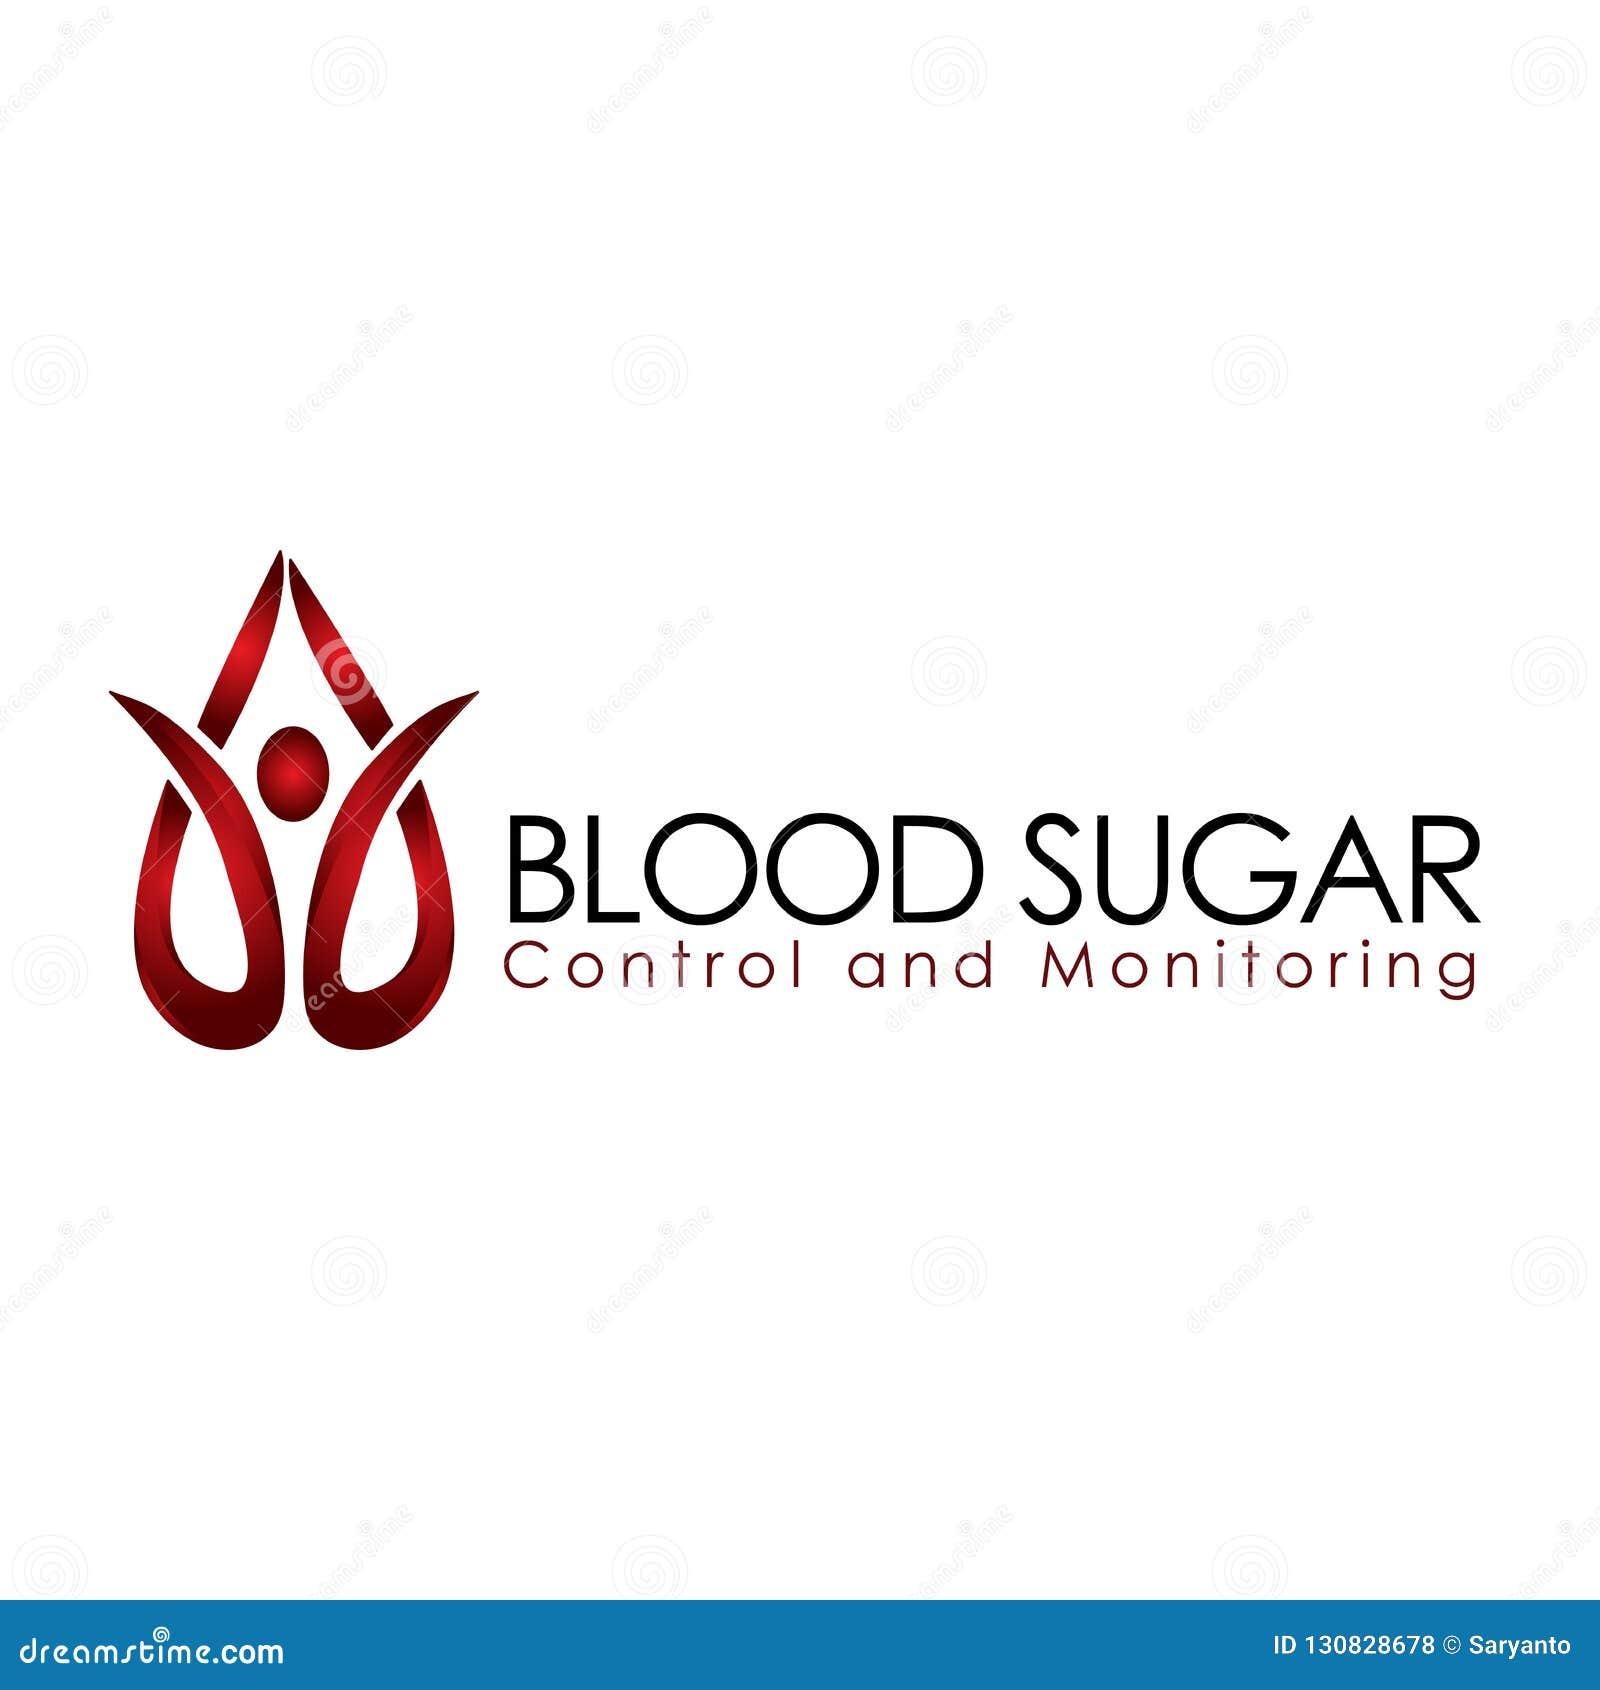 Blood sugar control and monitoring vector illustration